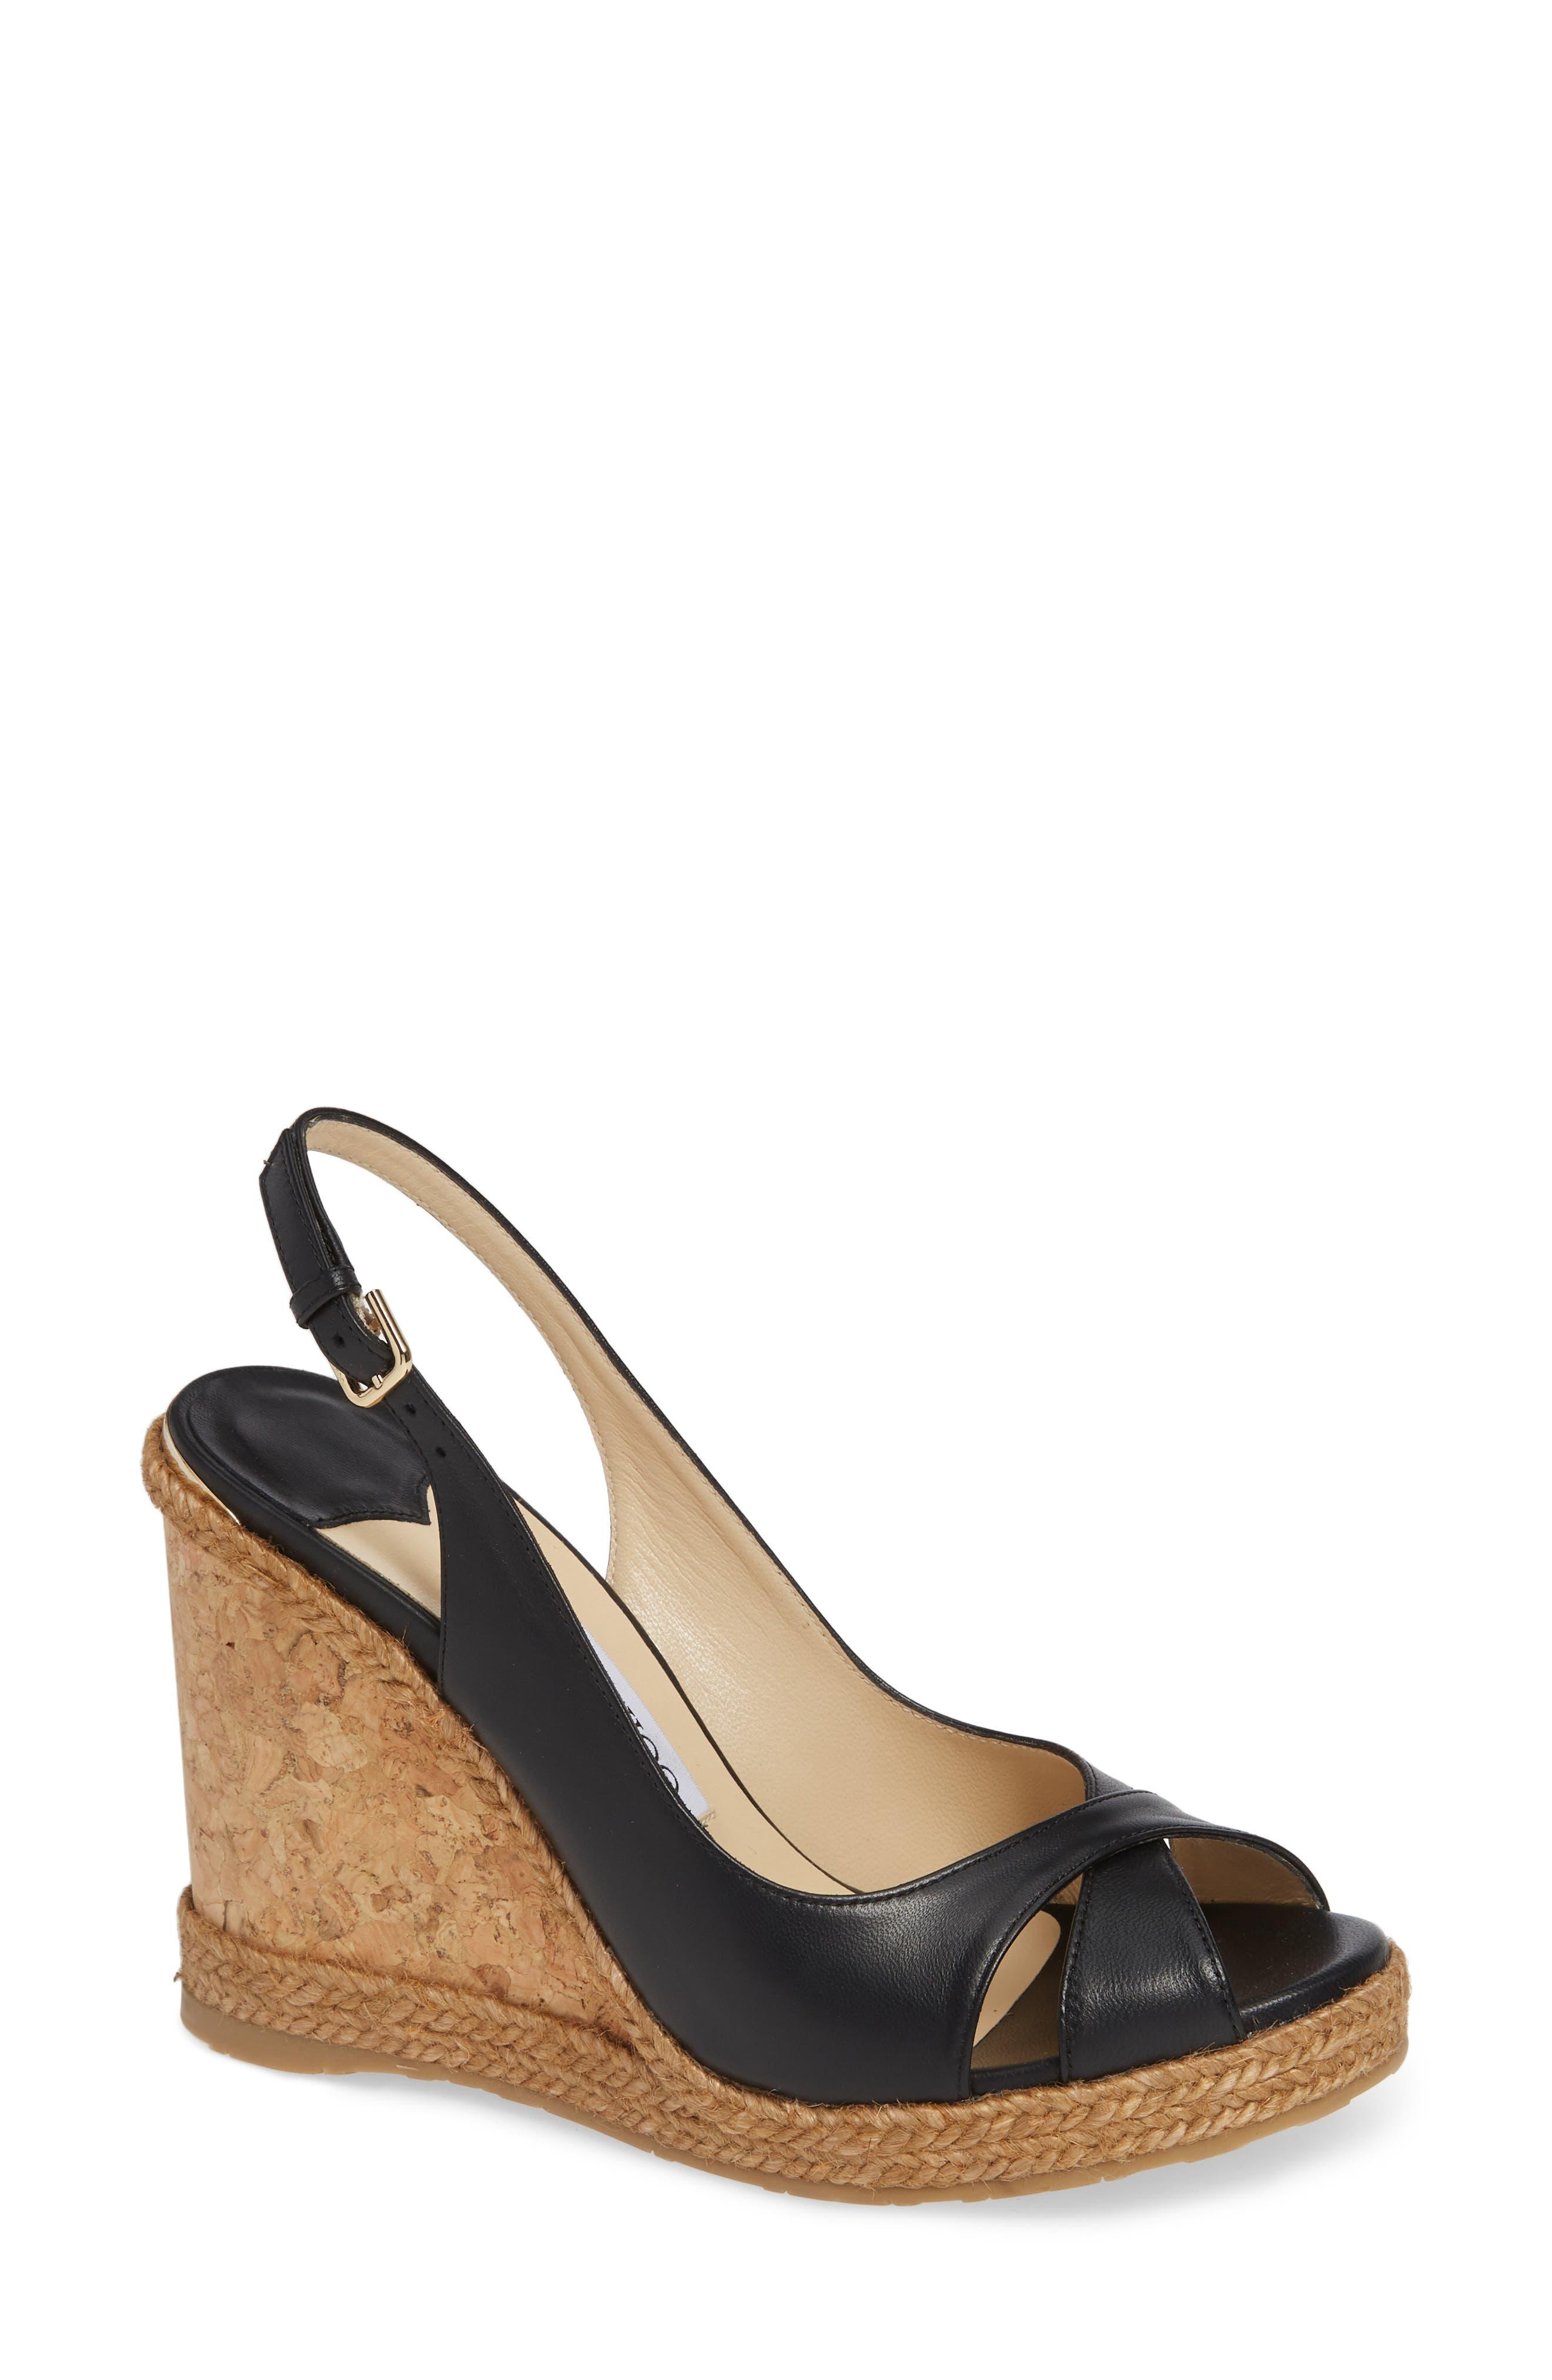 JIMMY CHOO Amely Slingback Wedge Sandal, Main, color, BLACK